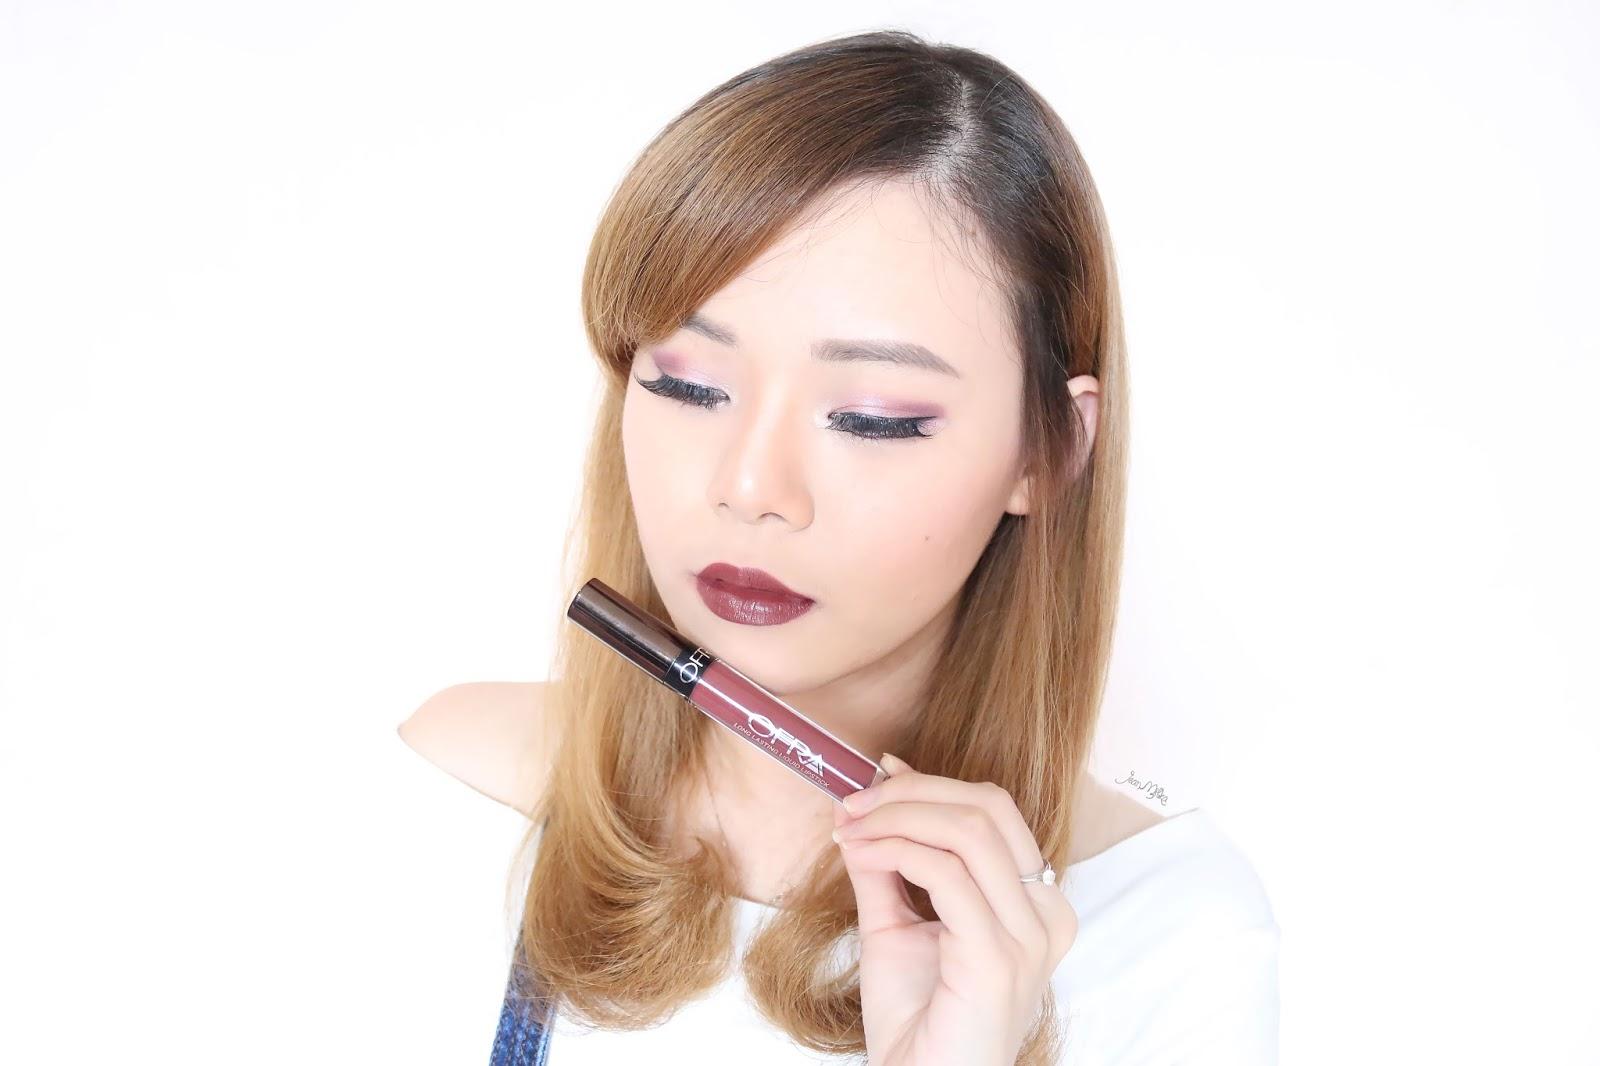 ofra x manny, ofraxmanny, ofra manny, ofra x manny mua, ofra, ofra cosmetics, ofra liquid lipstick, liquid lipstick, product review, swatches, beauty blog, ofra hypno